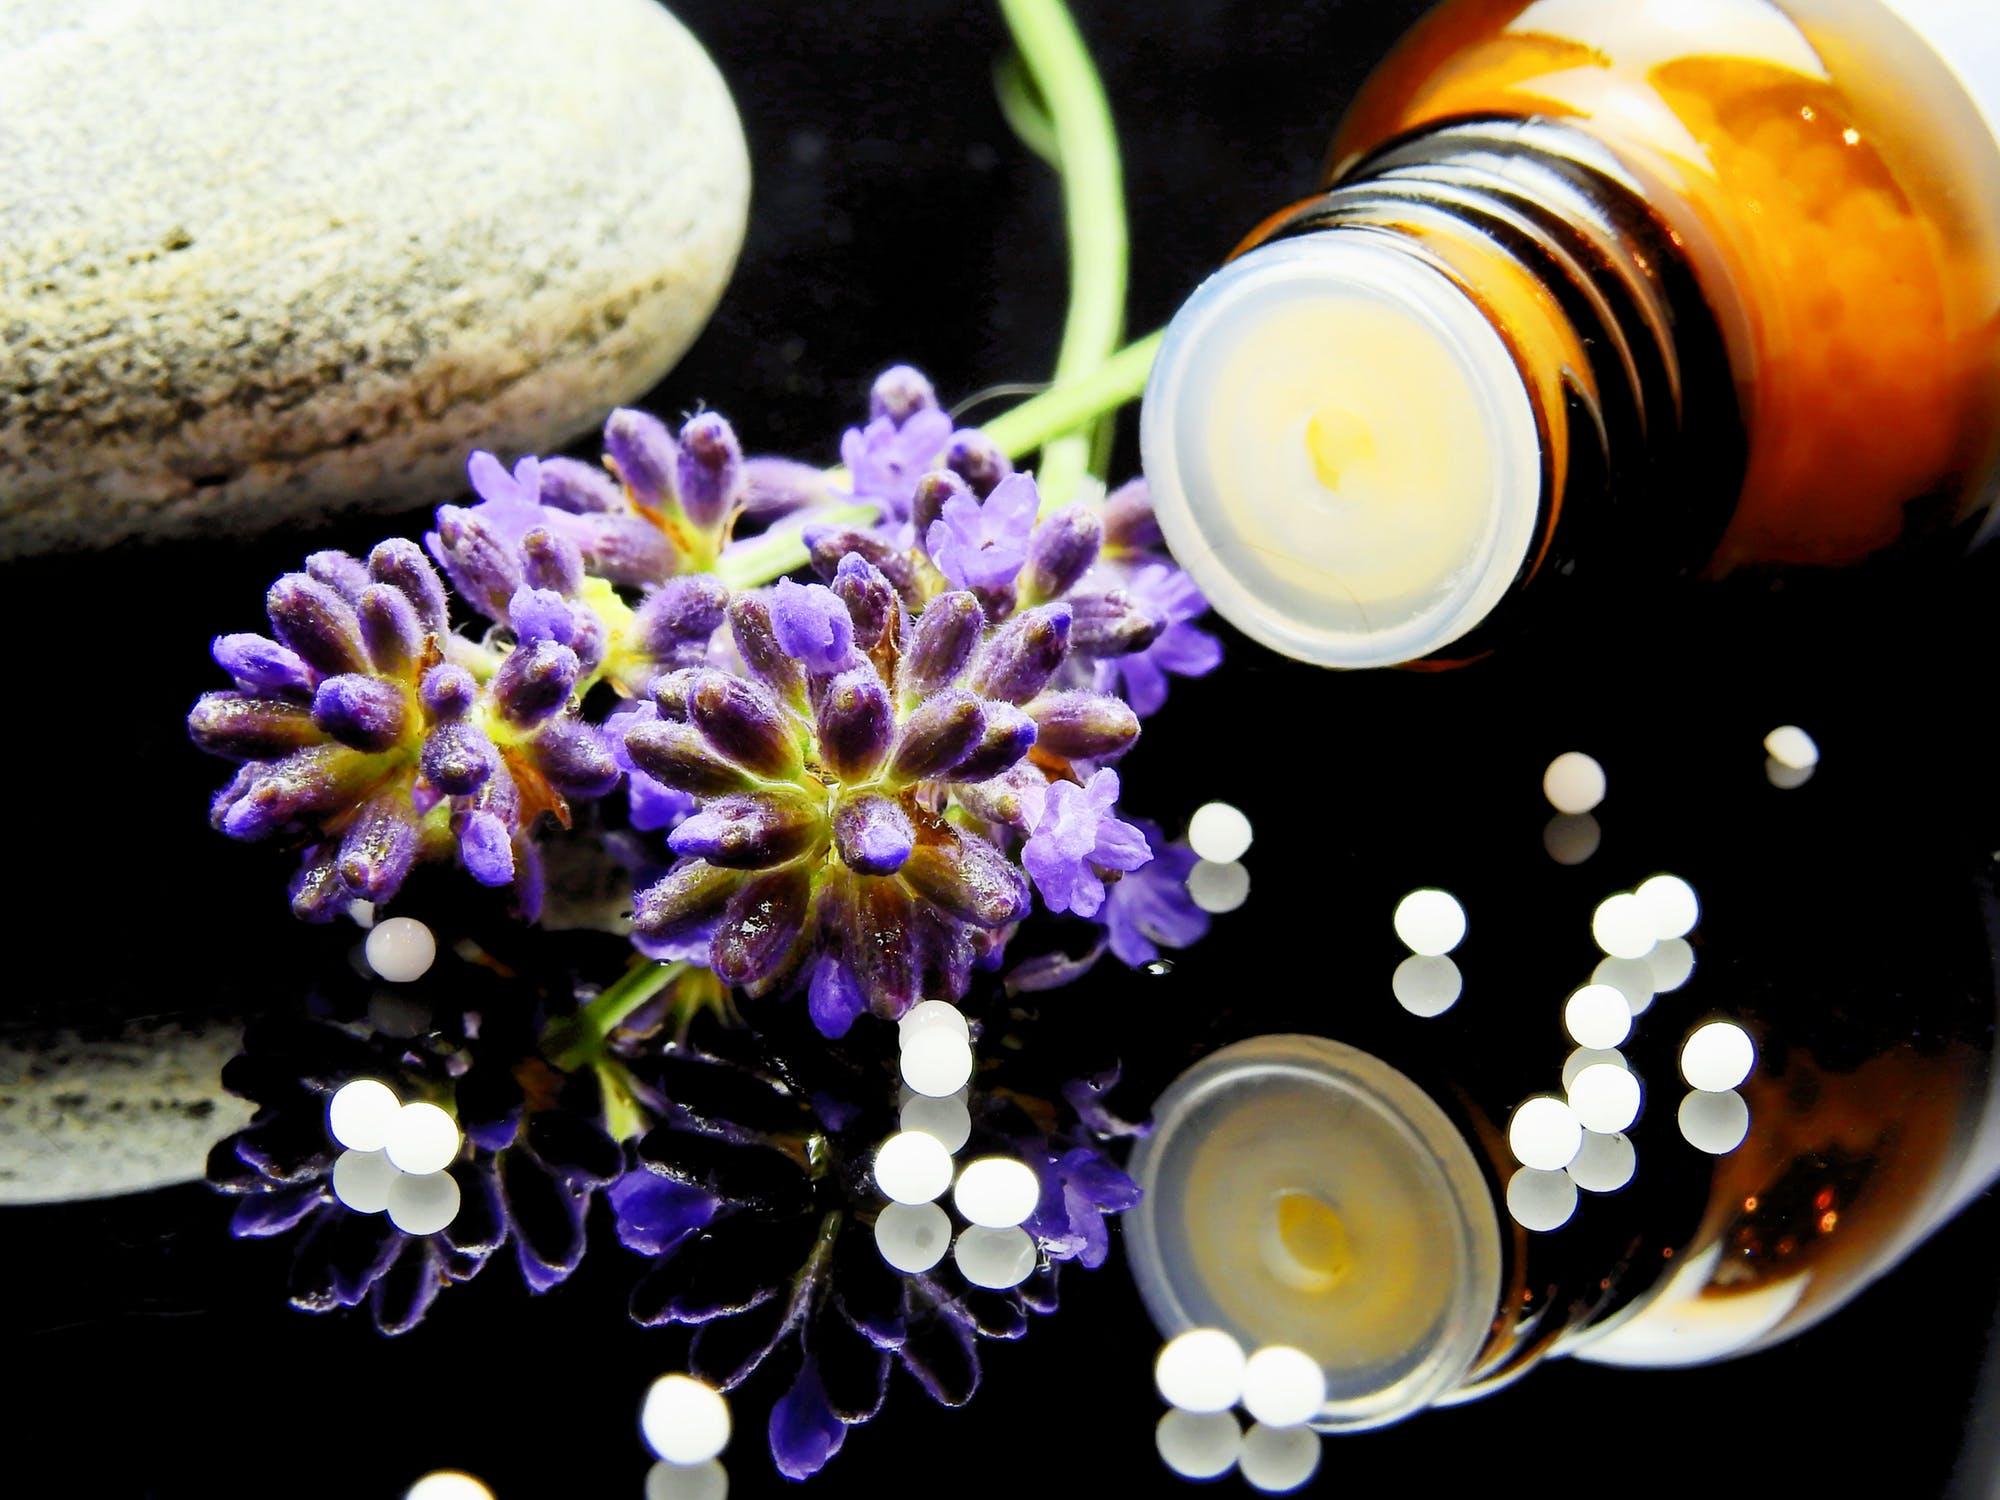 Homeopatija nas leči na prirodan i nežan način